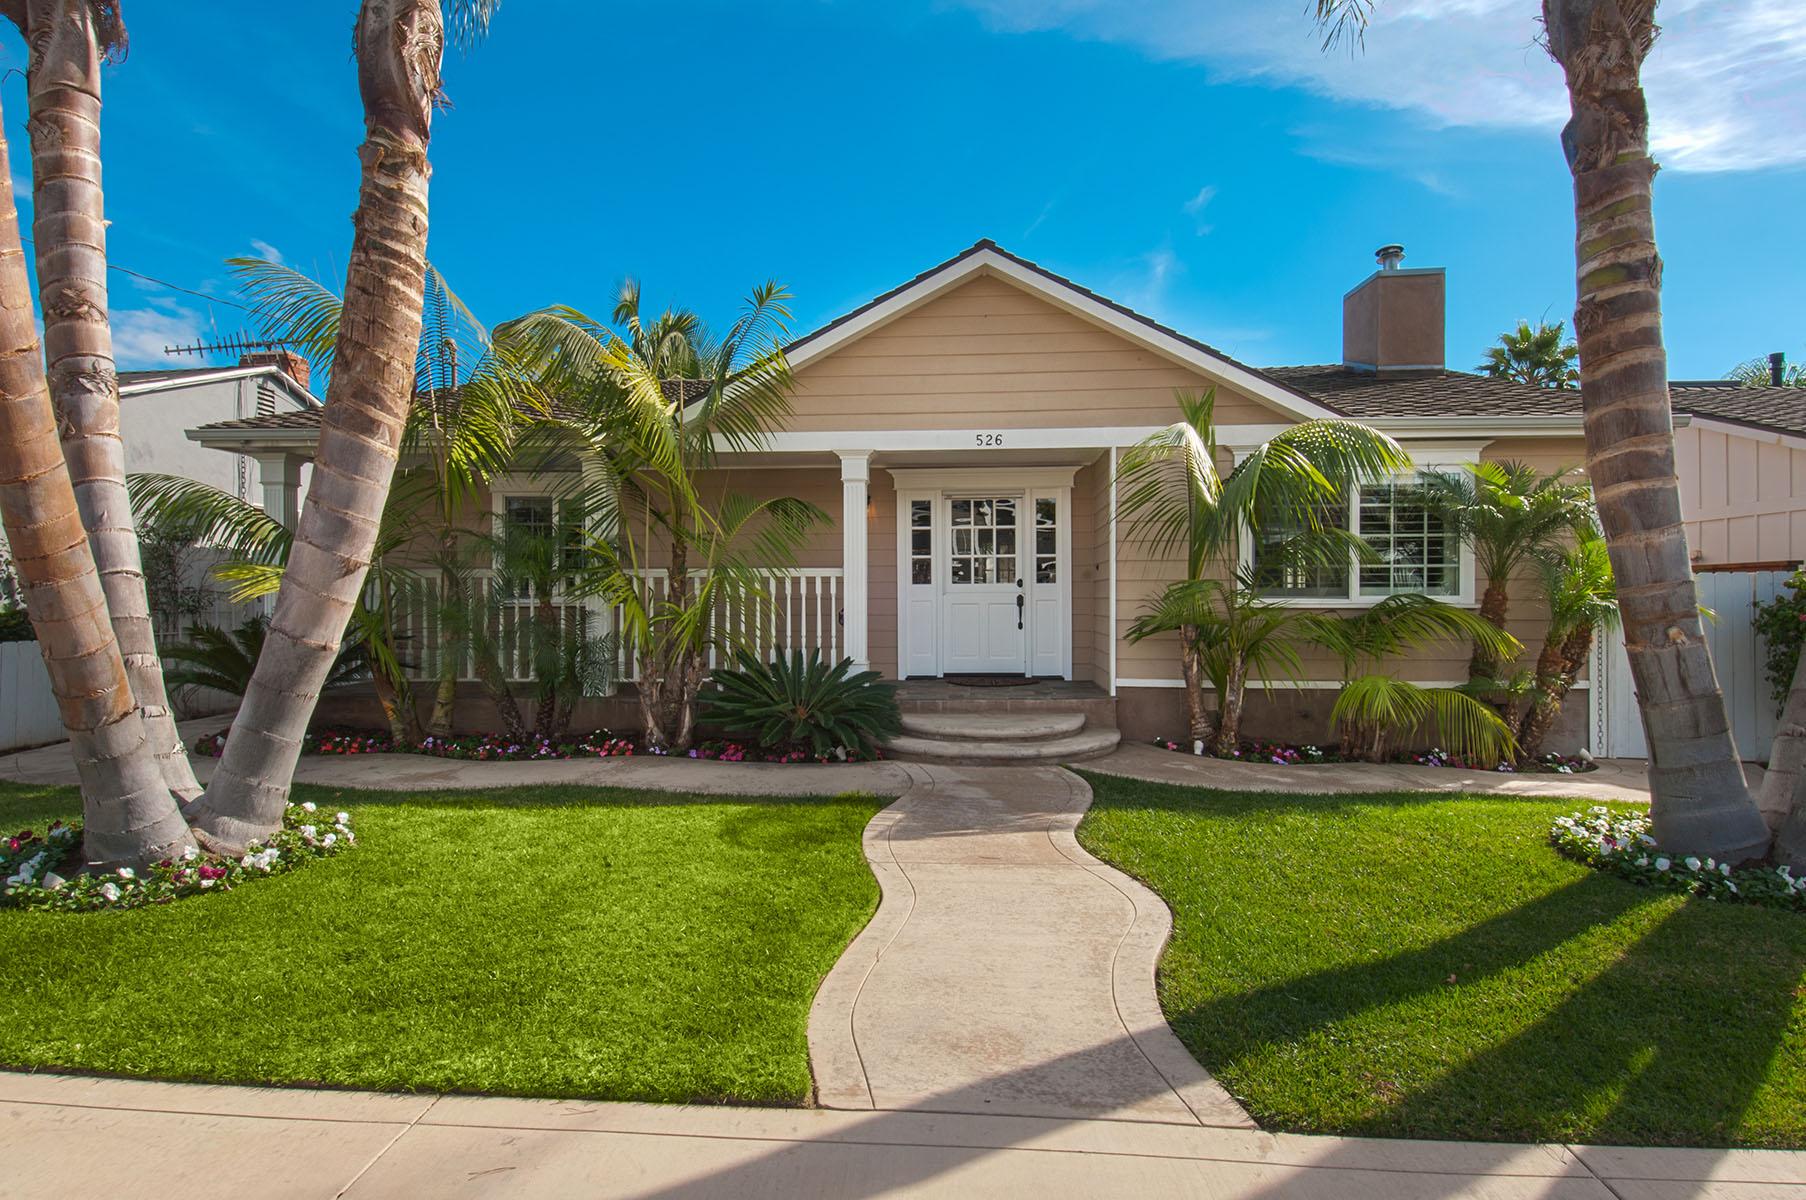 Casa Unifamiliar por un Venta en 526 Westminster Ave Newport Beach, California 92663 Estados Unidos